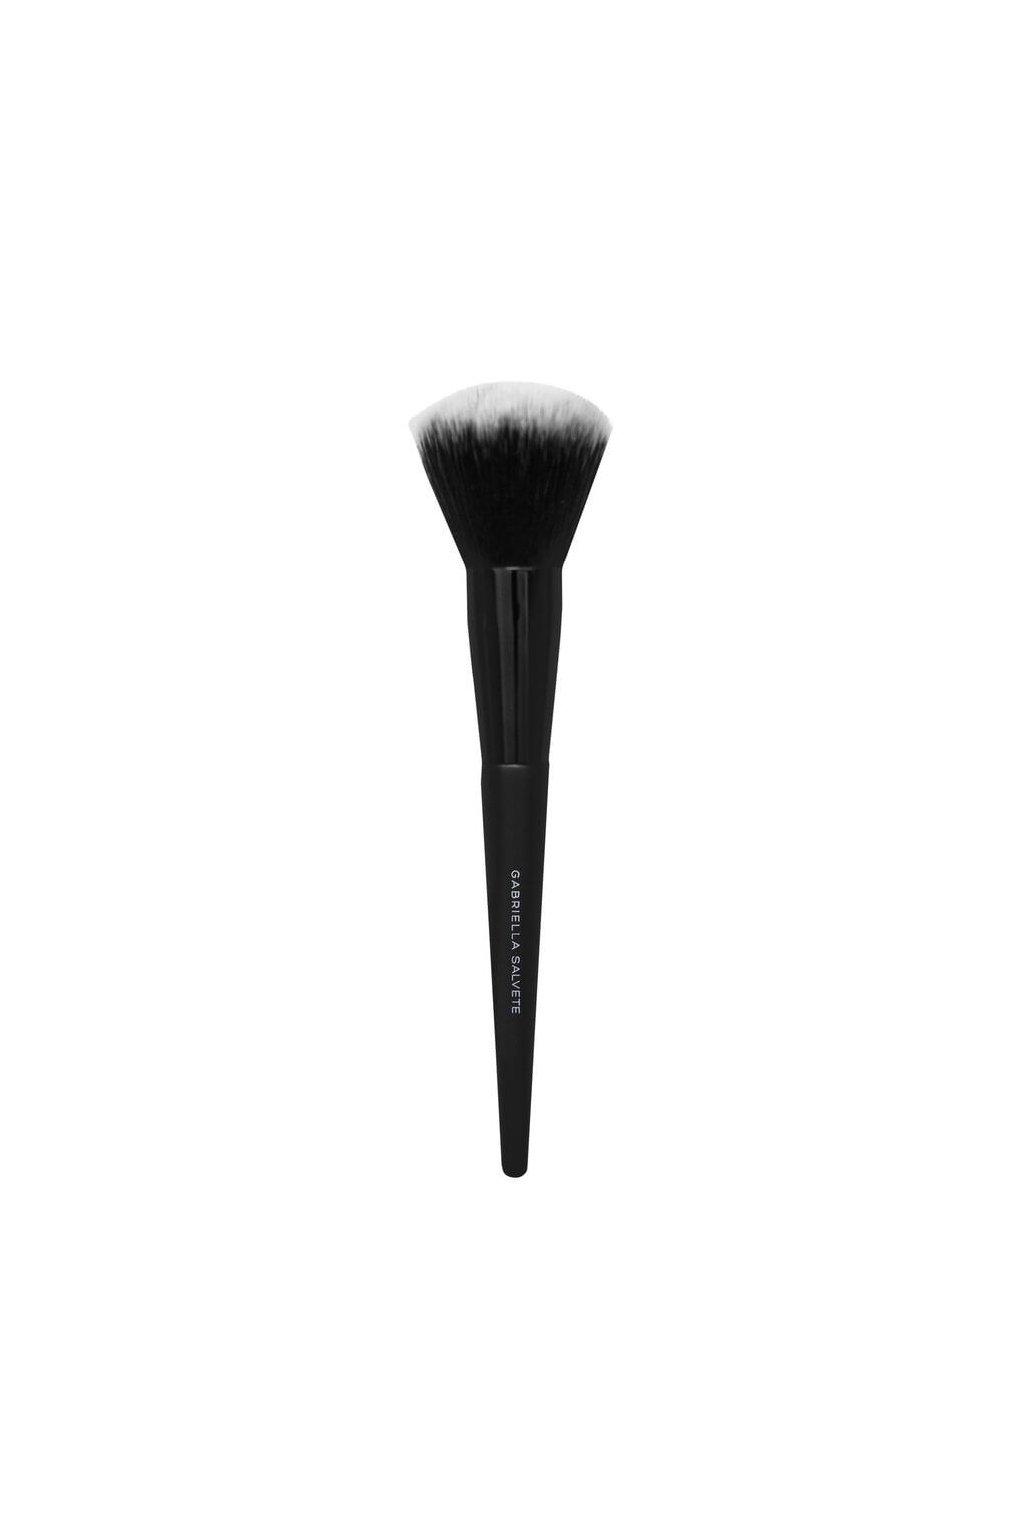 gabriella salvete kosmeticky stetec na pudr tools powder brush